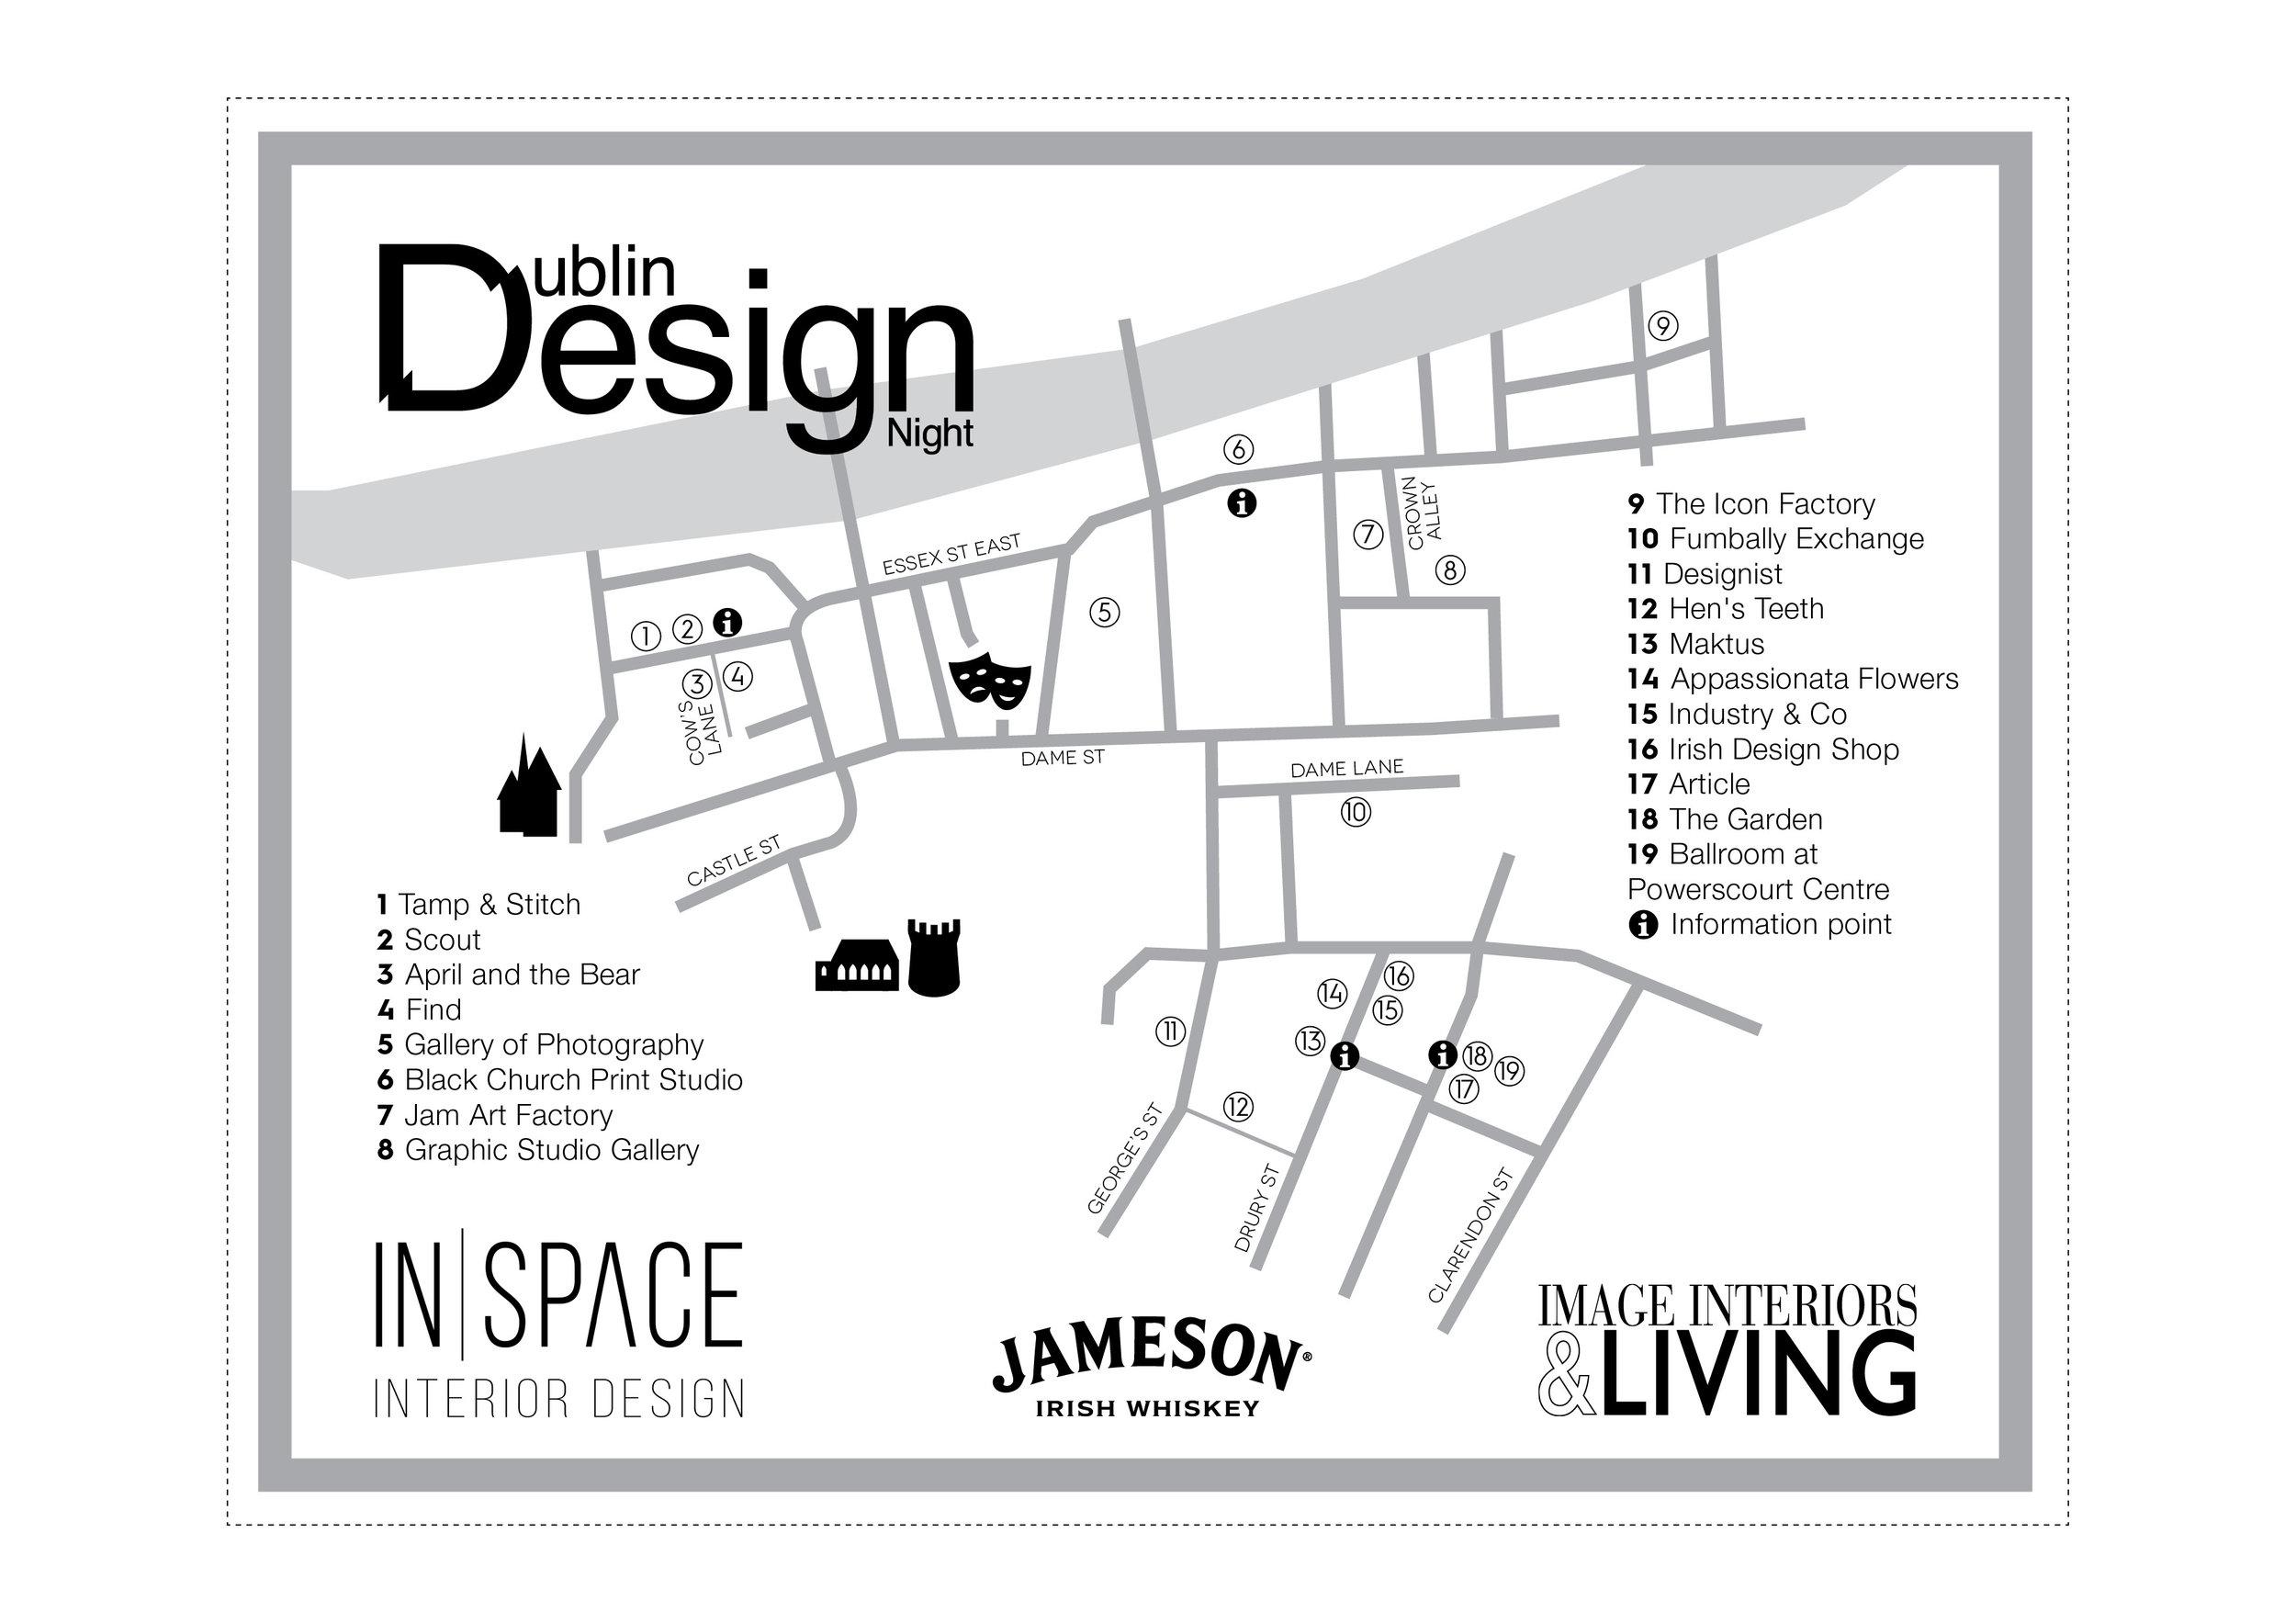 Dublin Design Night map Final.jpg